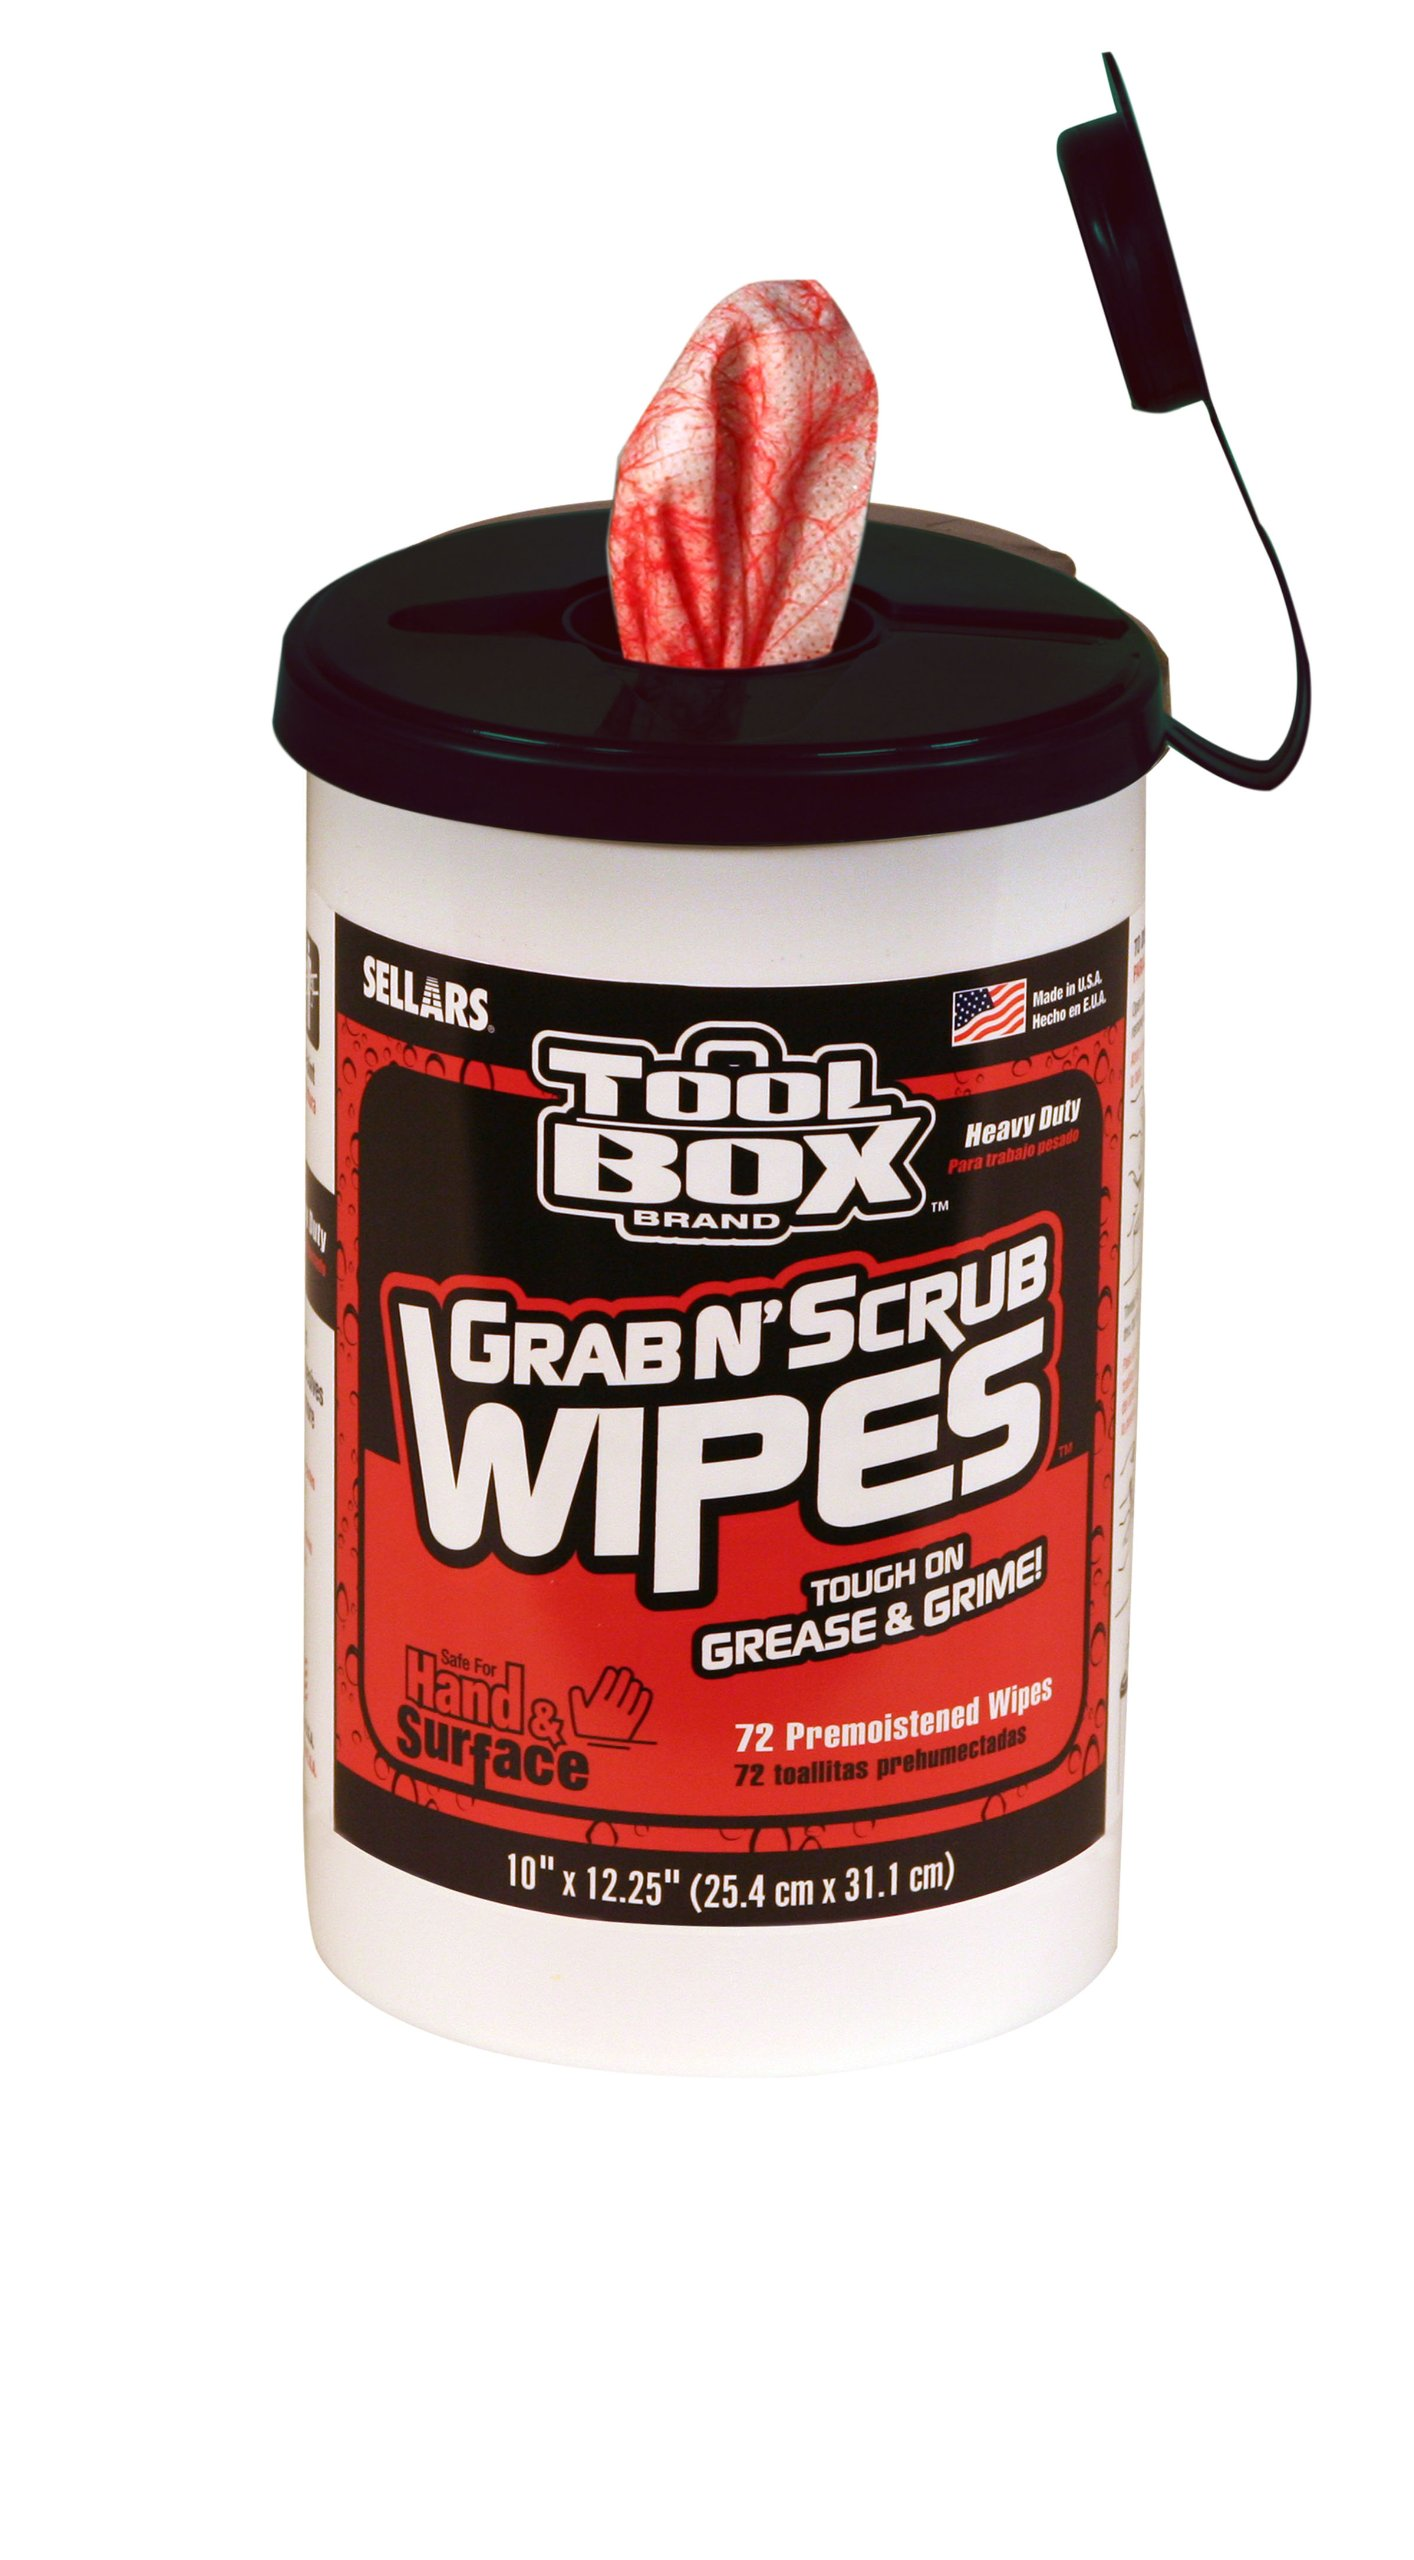 Sellars 90150 ToolBox Grab N' Scrub Wet Wiper, 12-1/4'' Length x 10'' Width, Red/White (6 Buckets of 72 Sheets) by Sellars Wipers & Sorbents